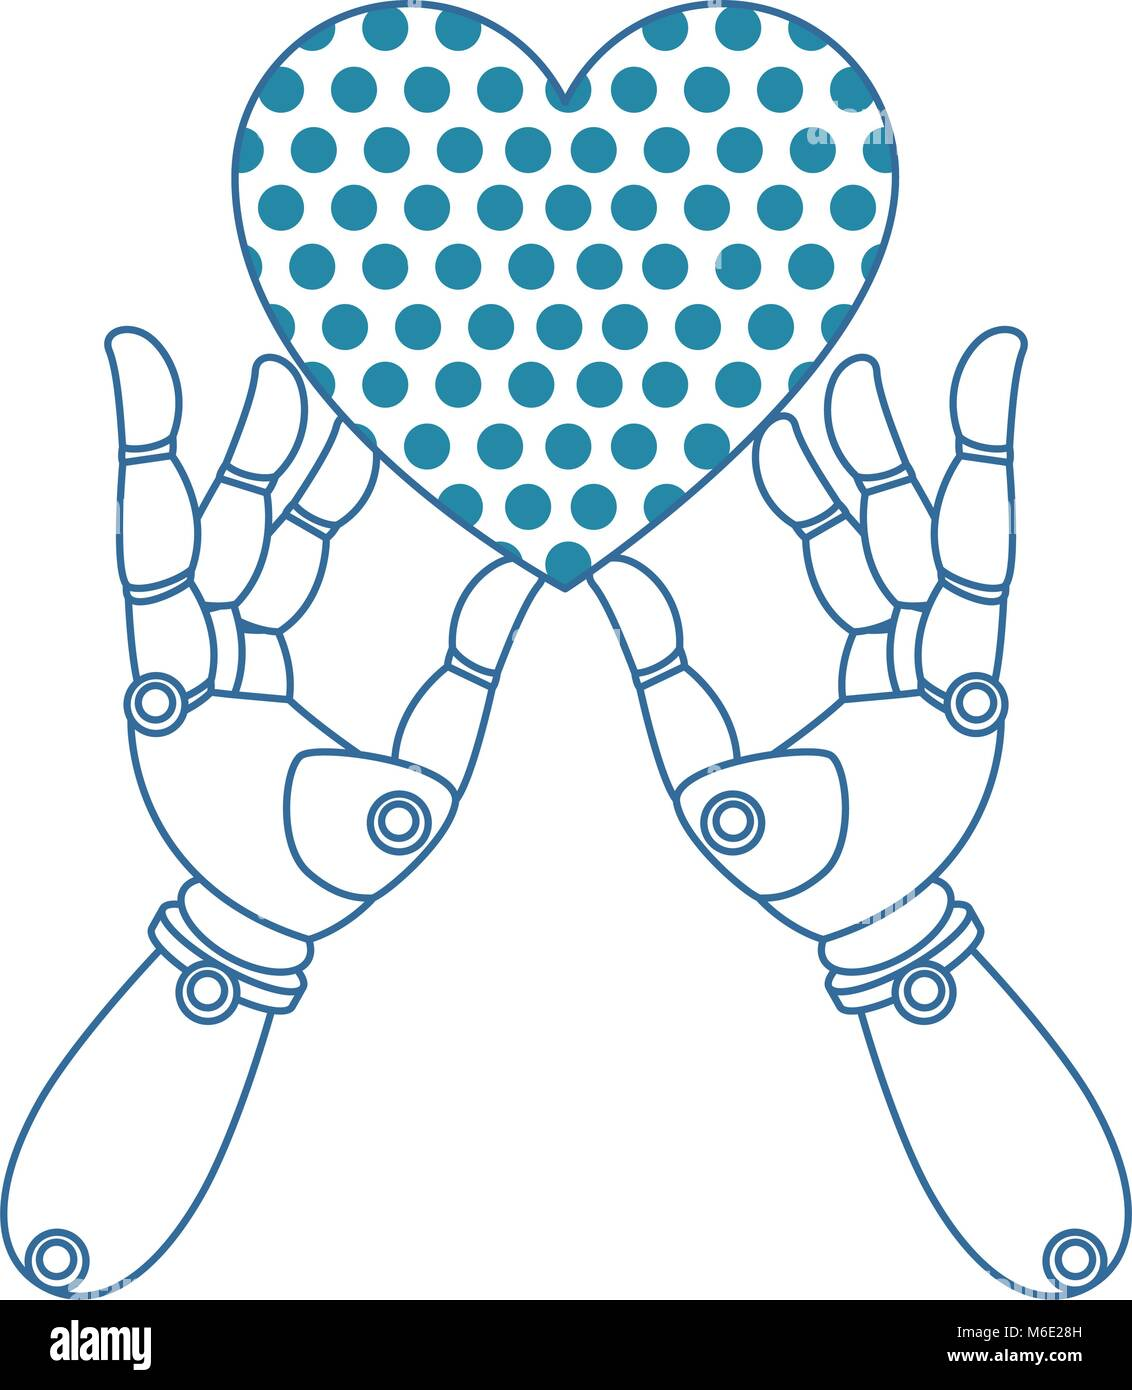 Robot Hand Heart Stock Photos & Robot Hand Heart Stock Images - Alamy